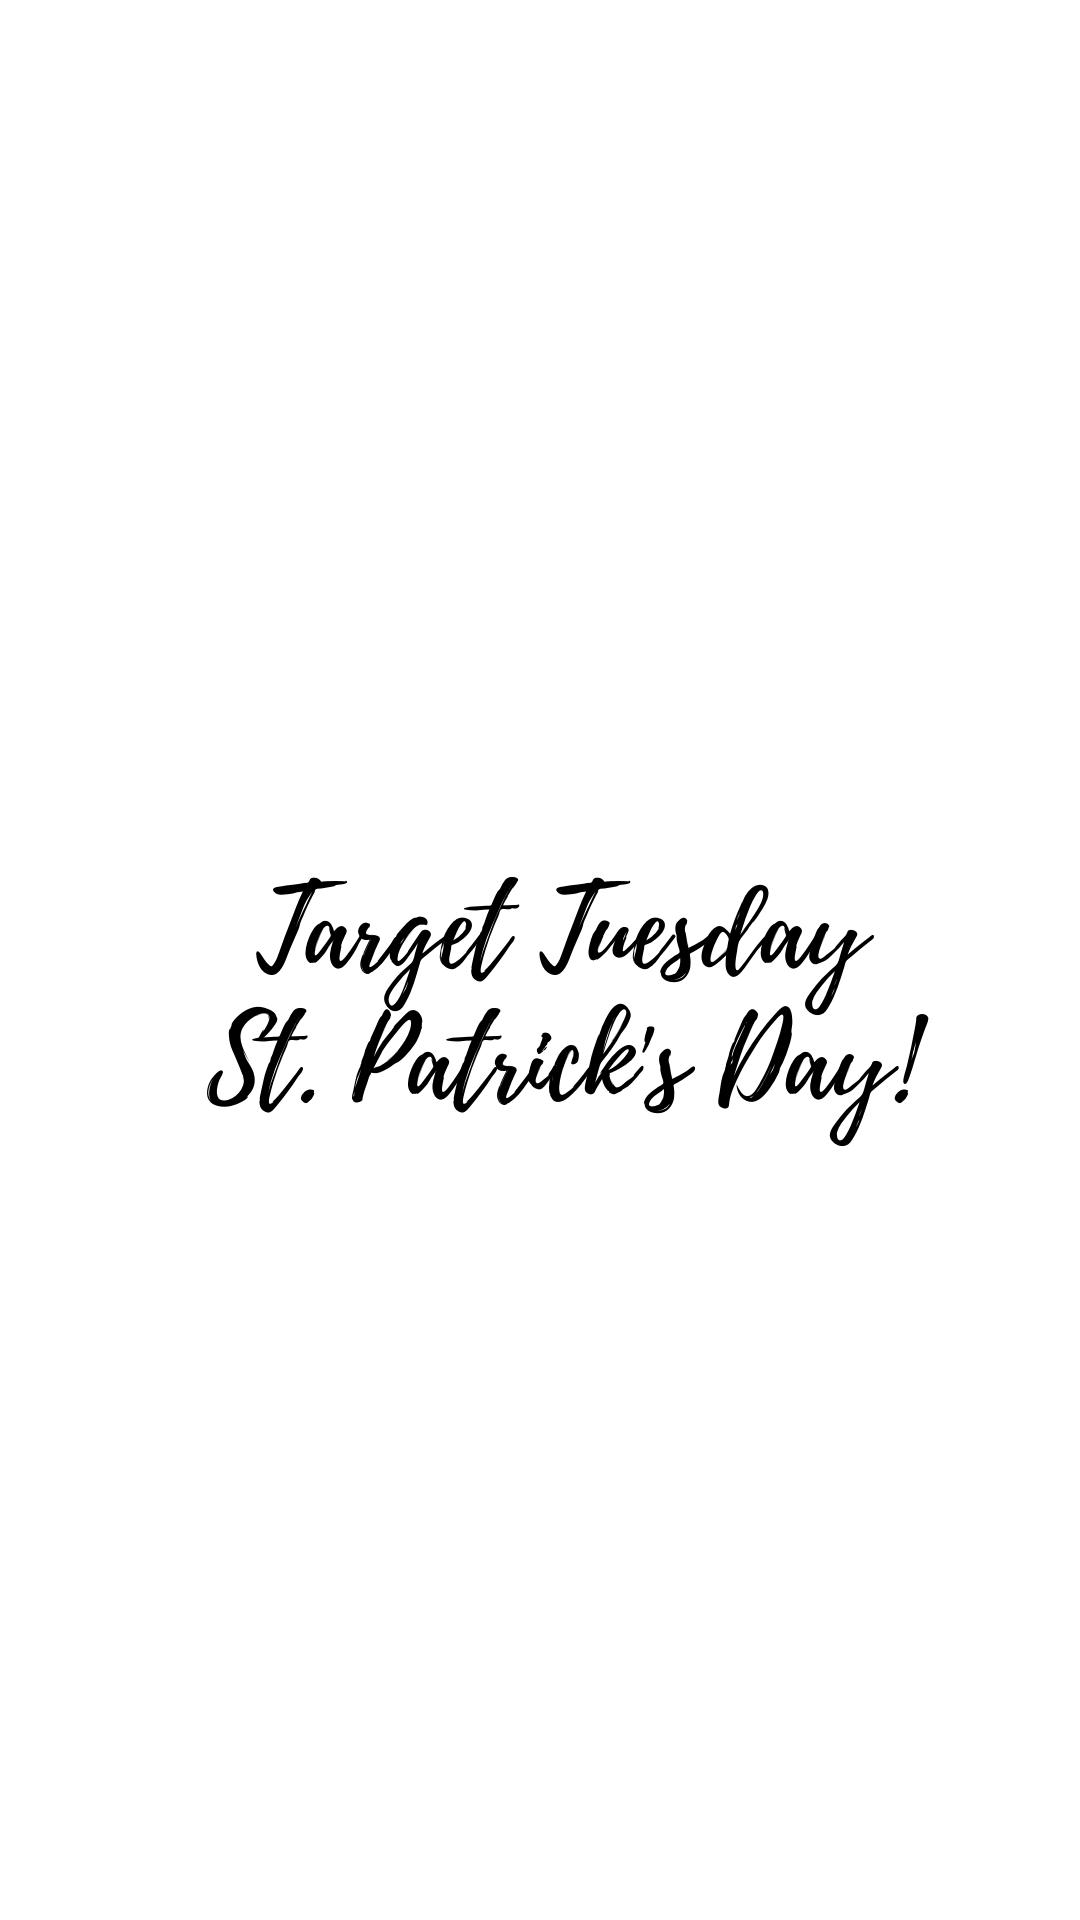 sarah bowmar target tuesday st. patrick's day